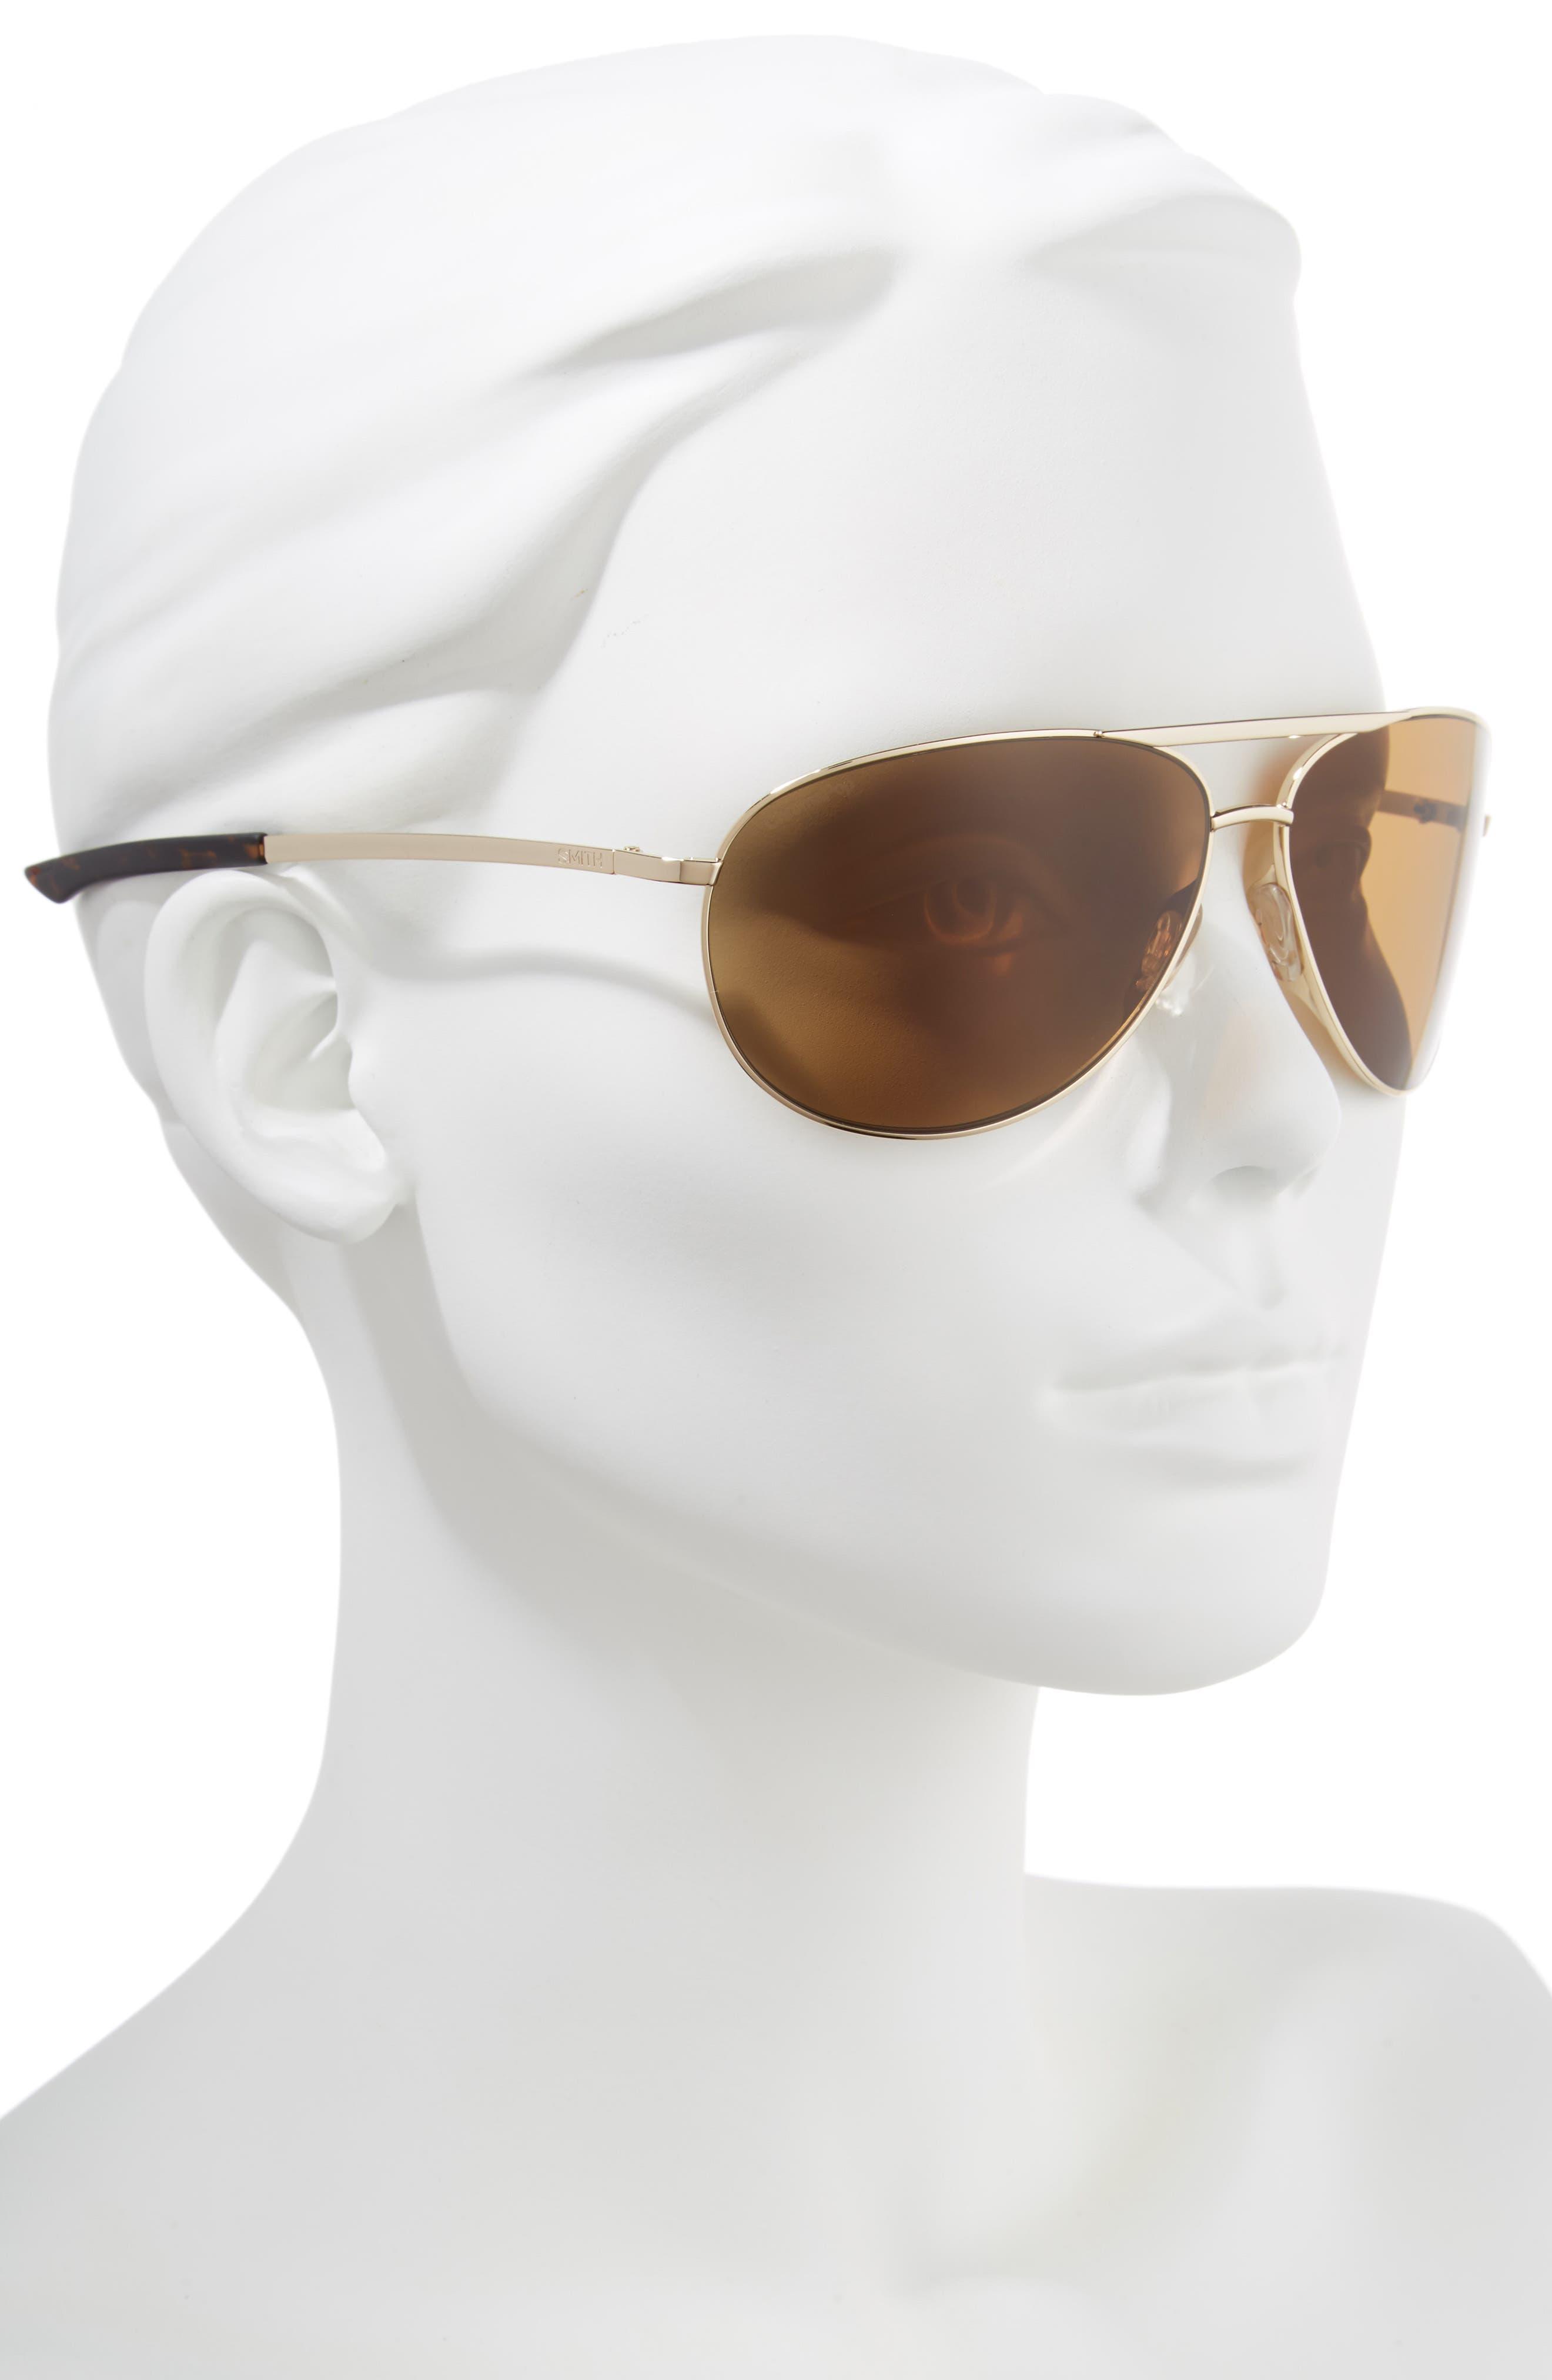 Serpico Slim 2.0 65mm ChromaPop<sup>™</sup> Polarized Aviator Sunglasses,                             Alternate thumbnail 2, color,                             GOLD/ BROWN POLAR